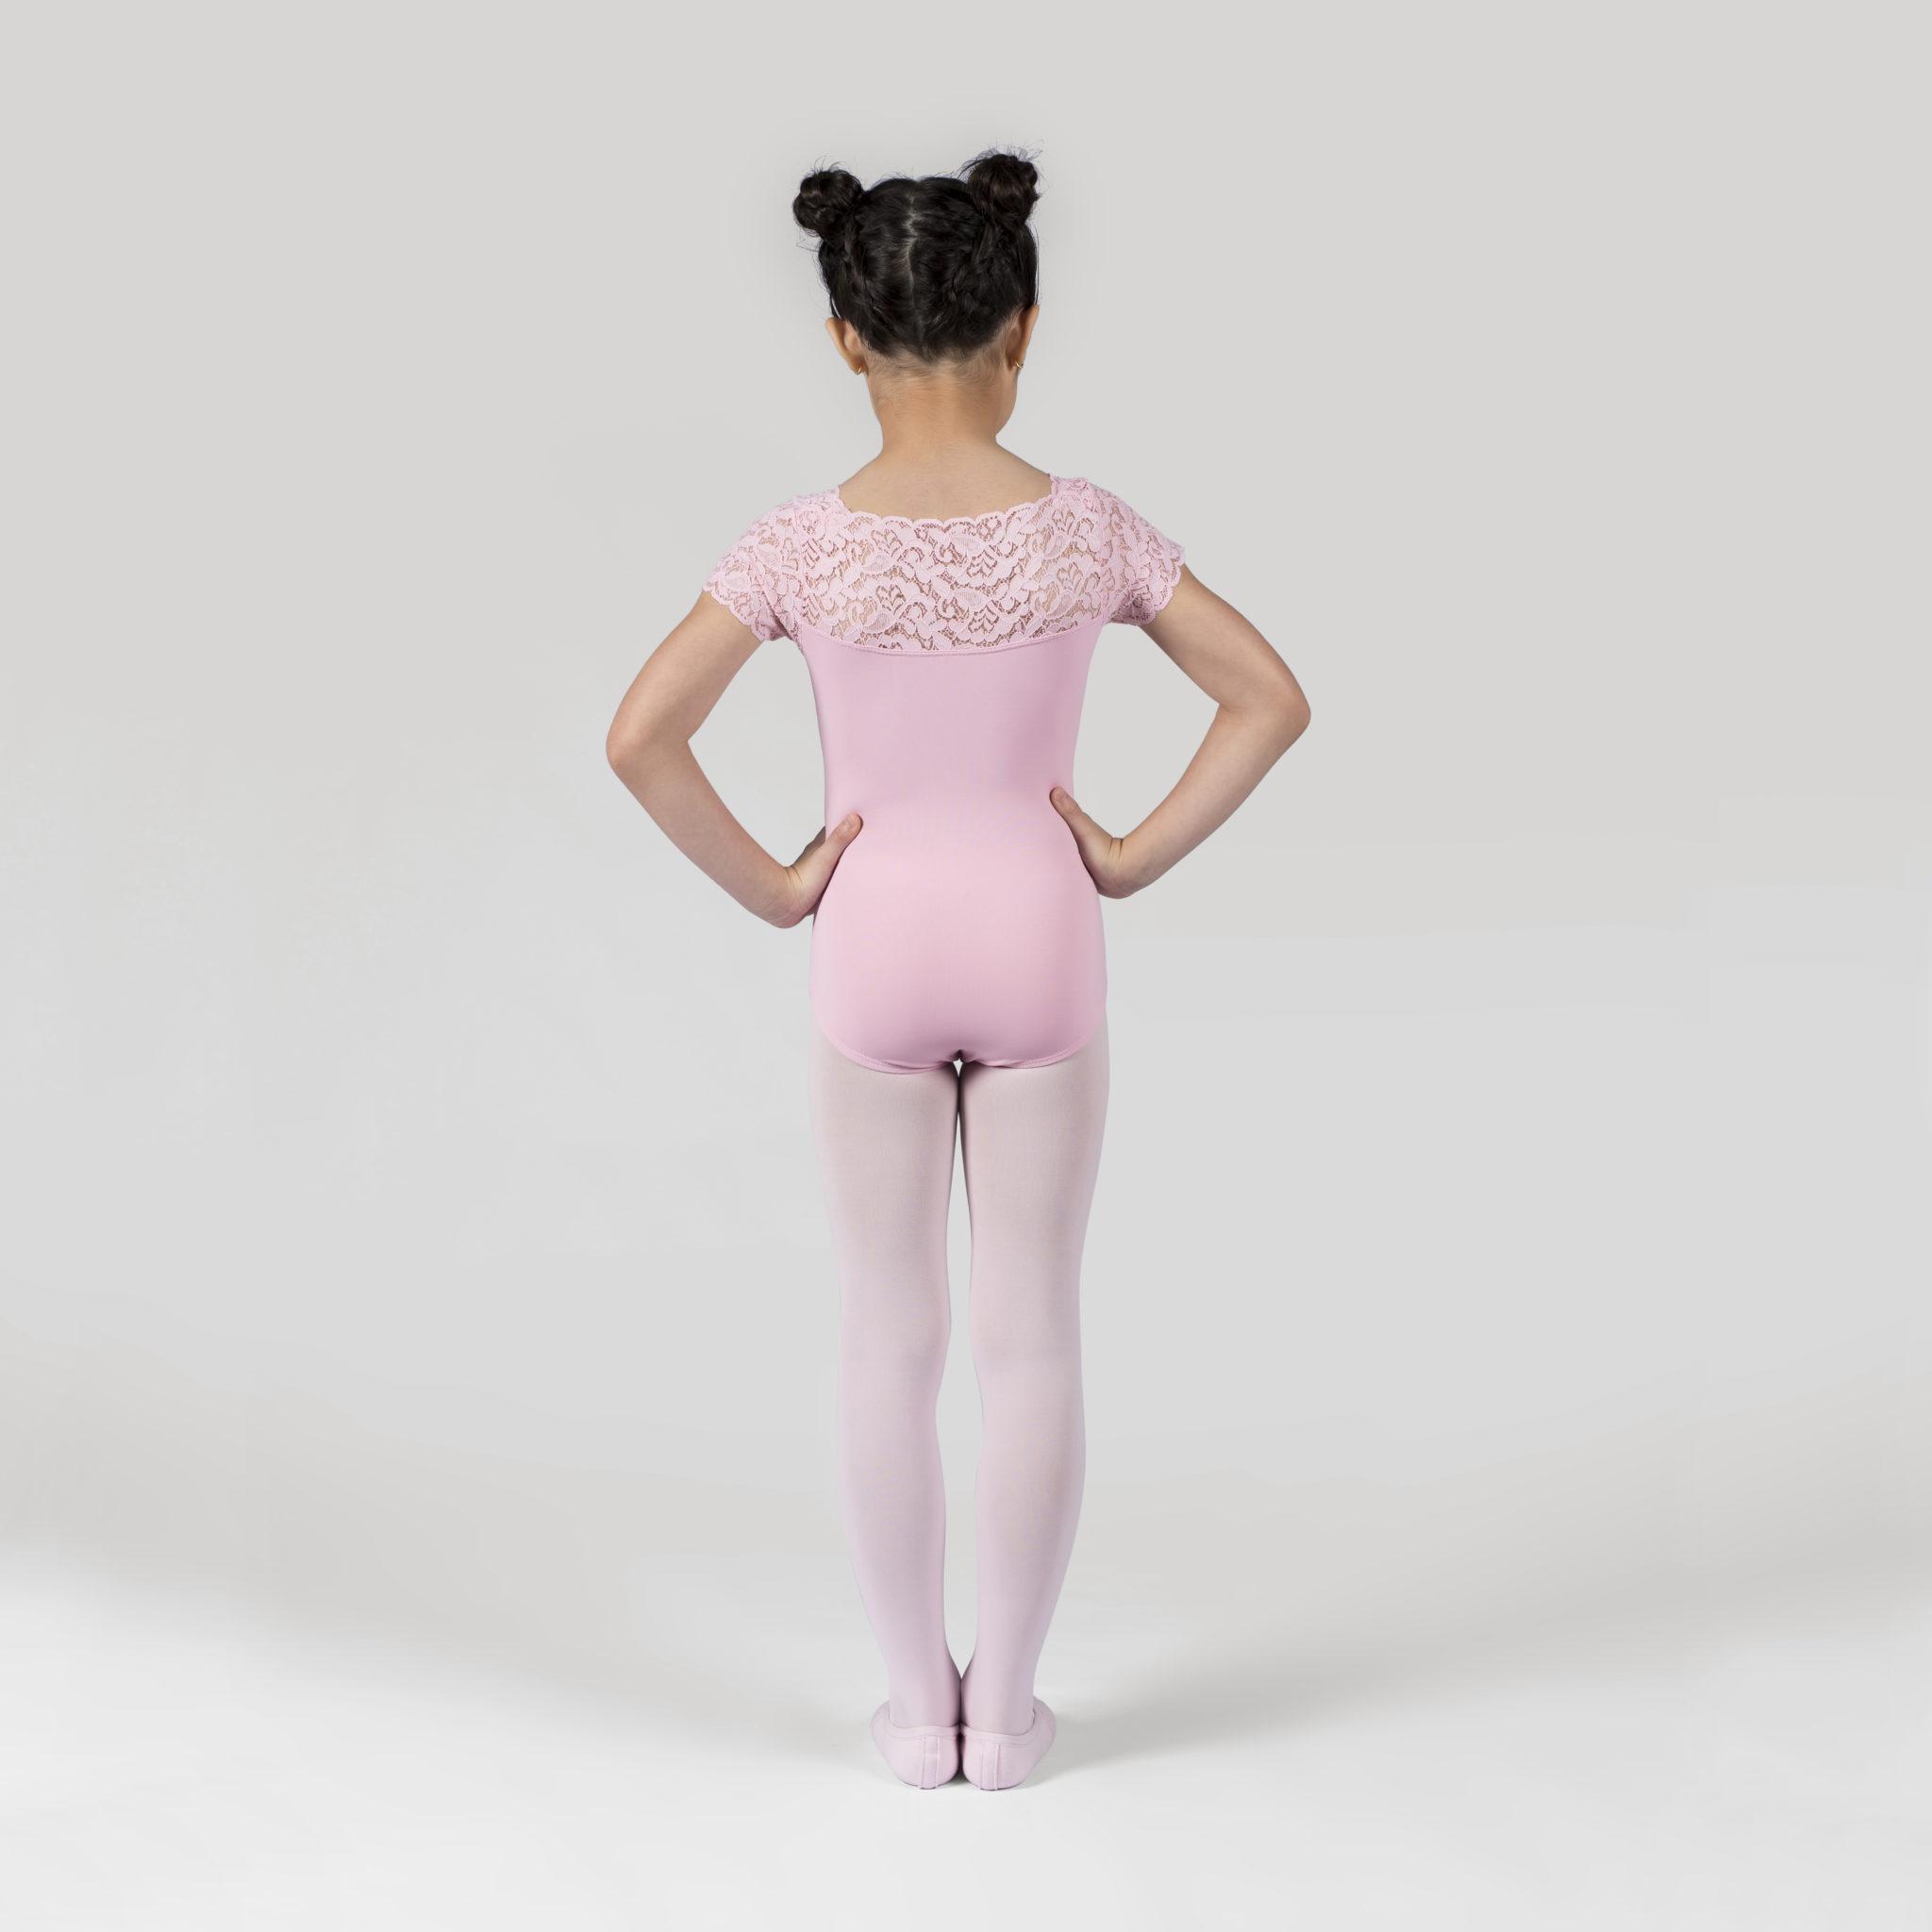 b08b06bcb3 Collant Em Amni Infantil Com Renda - 712 - Evidence Ballet - Loja ...